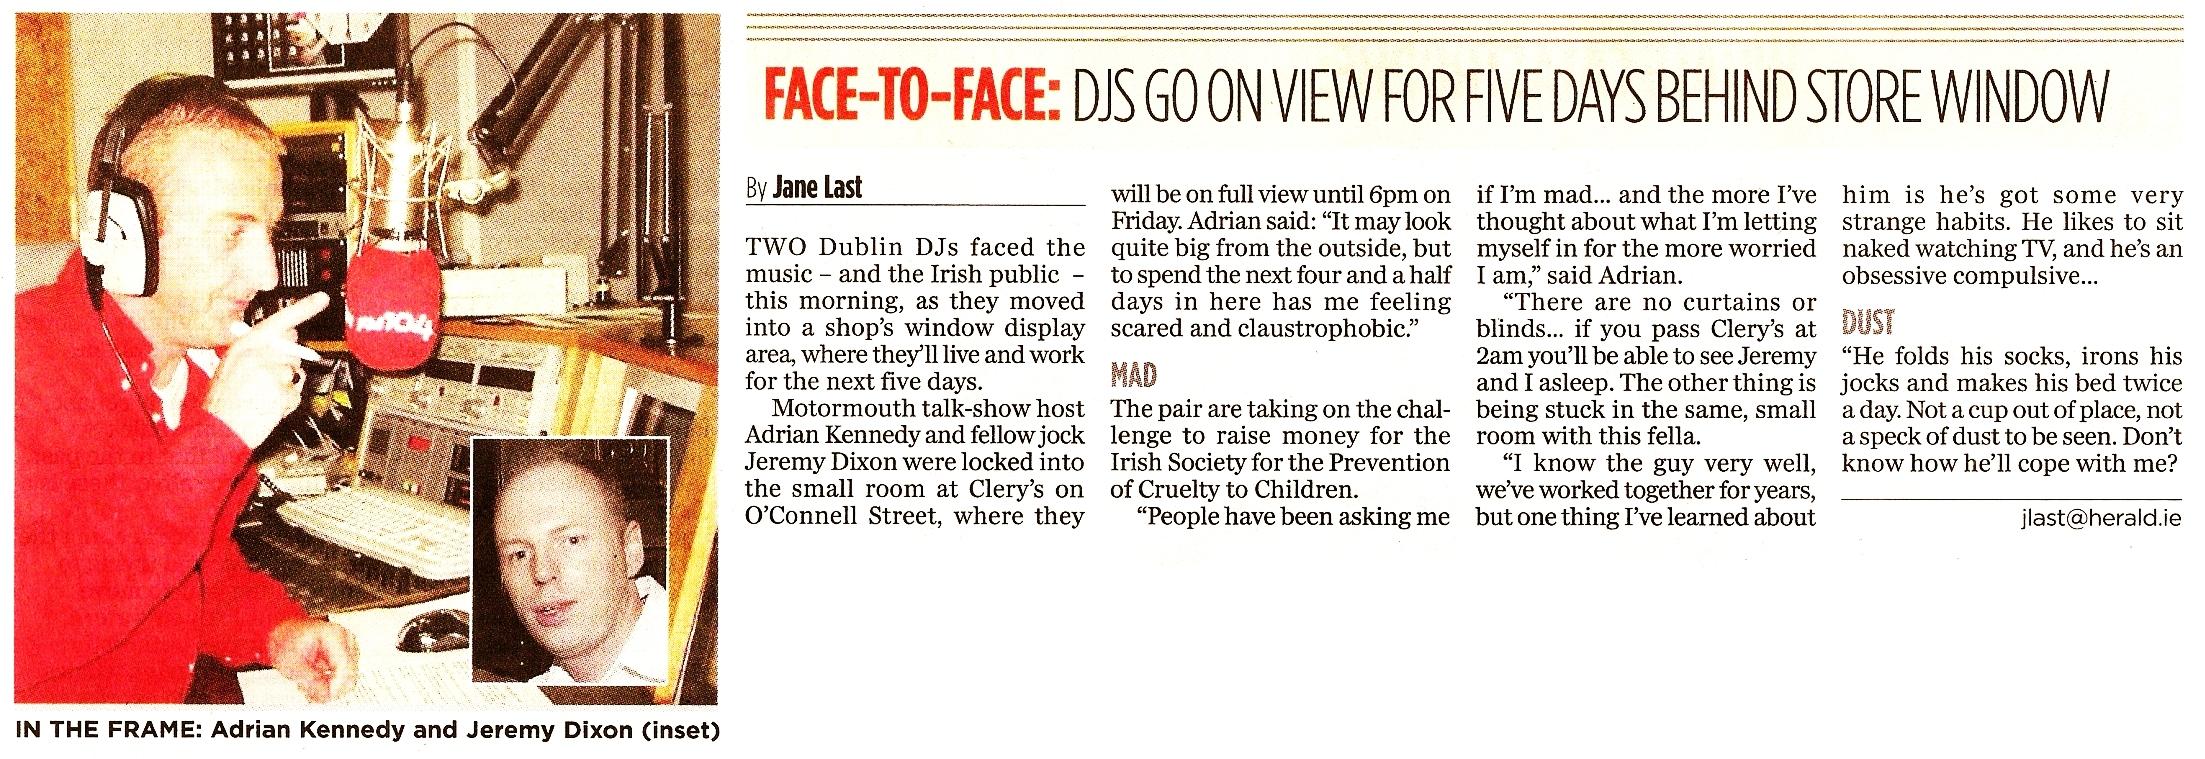 Evening Herald - Face to face